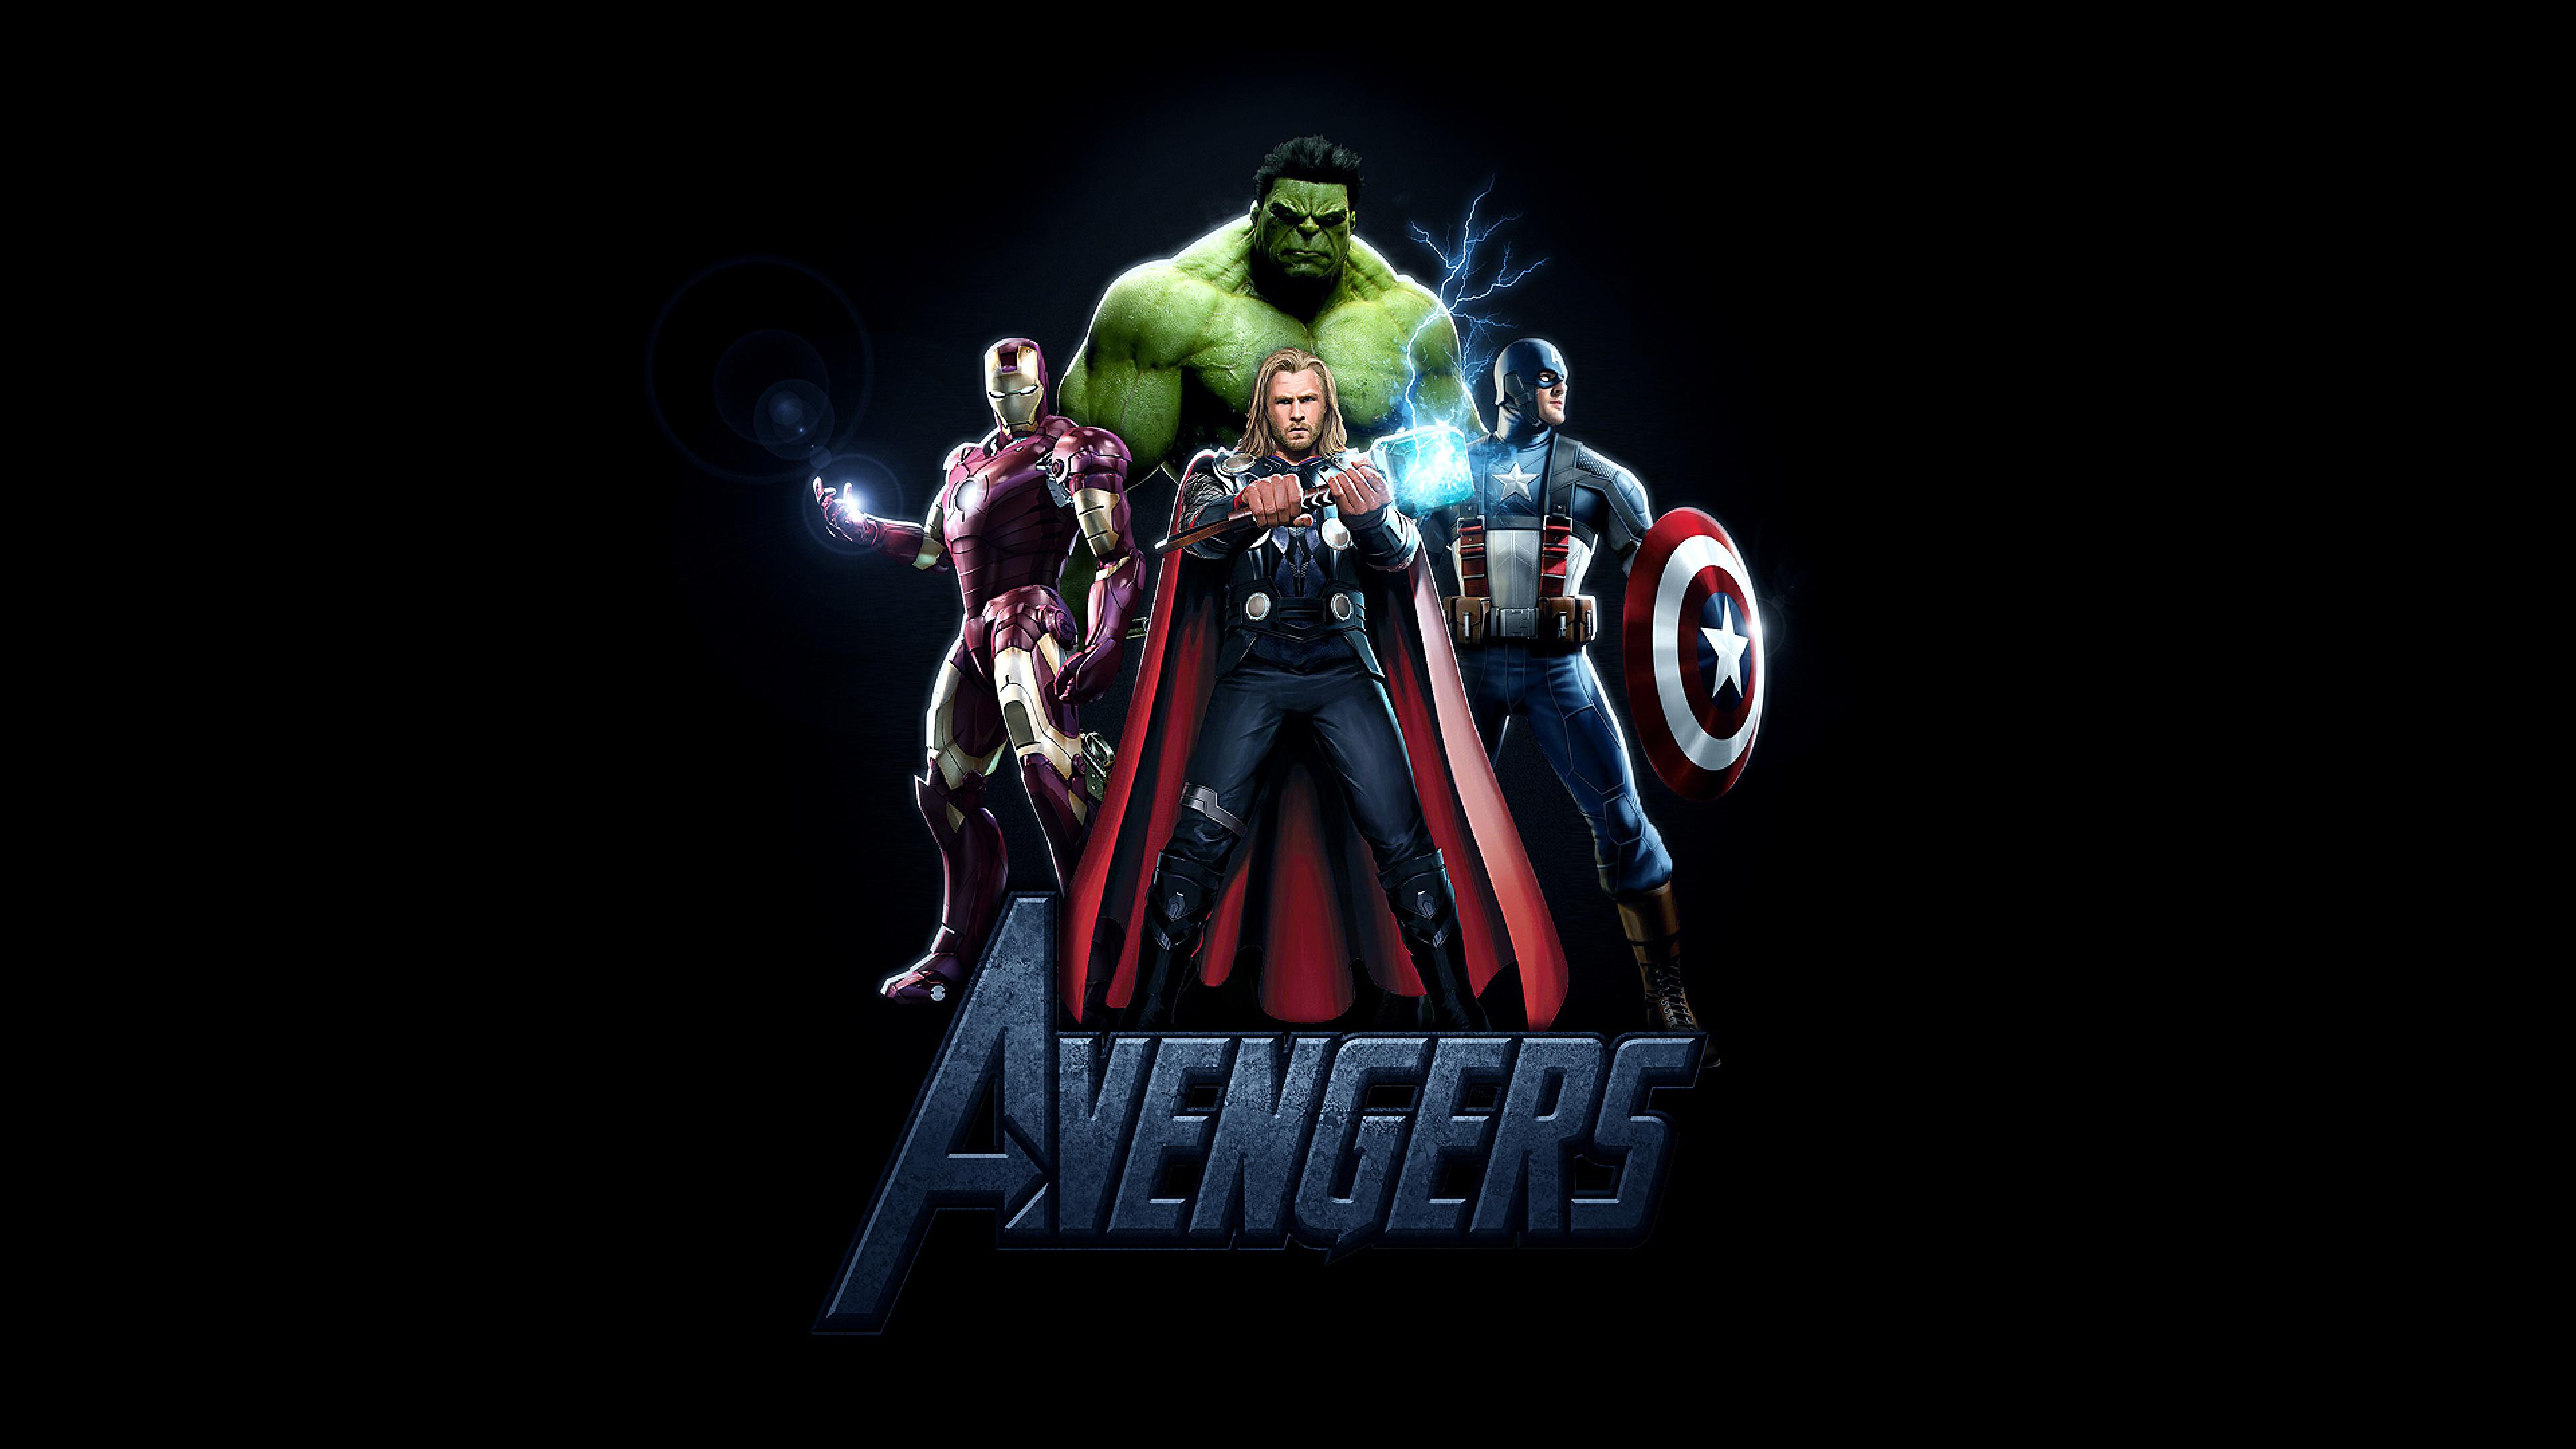 3840x2160 Avengers Thor Iron Man Captain America And Hulk Poster